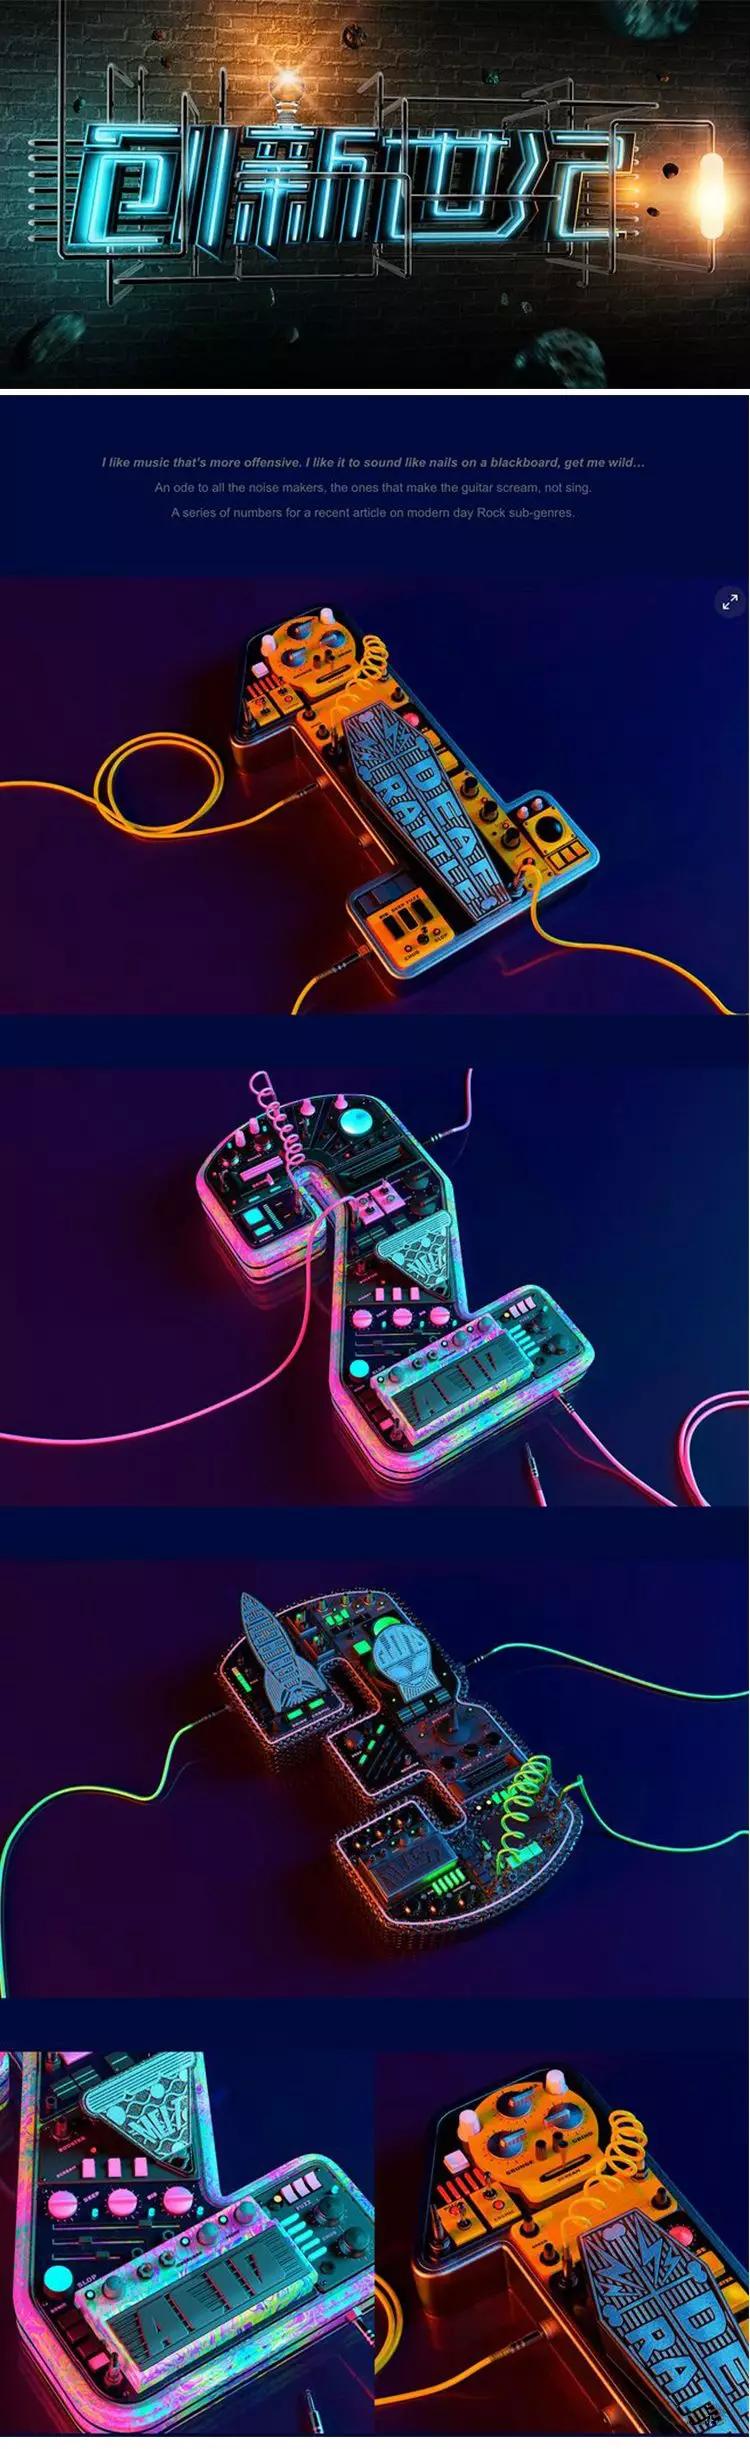 CD4软件-教程 Maxon Cinema 4D Studio R21 中文免费版全套教程 C4Dr19/r20/r21/设计酷COOK-设计酷-设计酷COOK-这设计很酷COOL